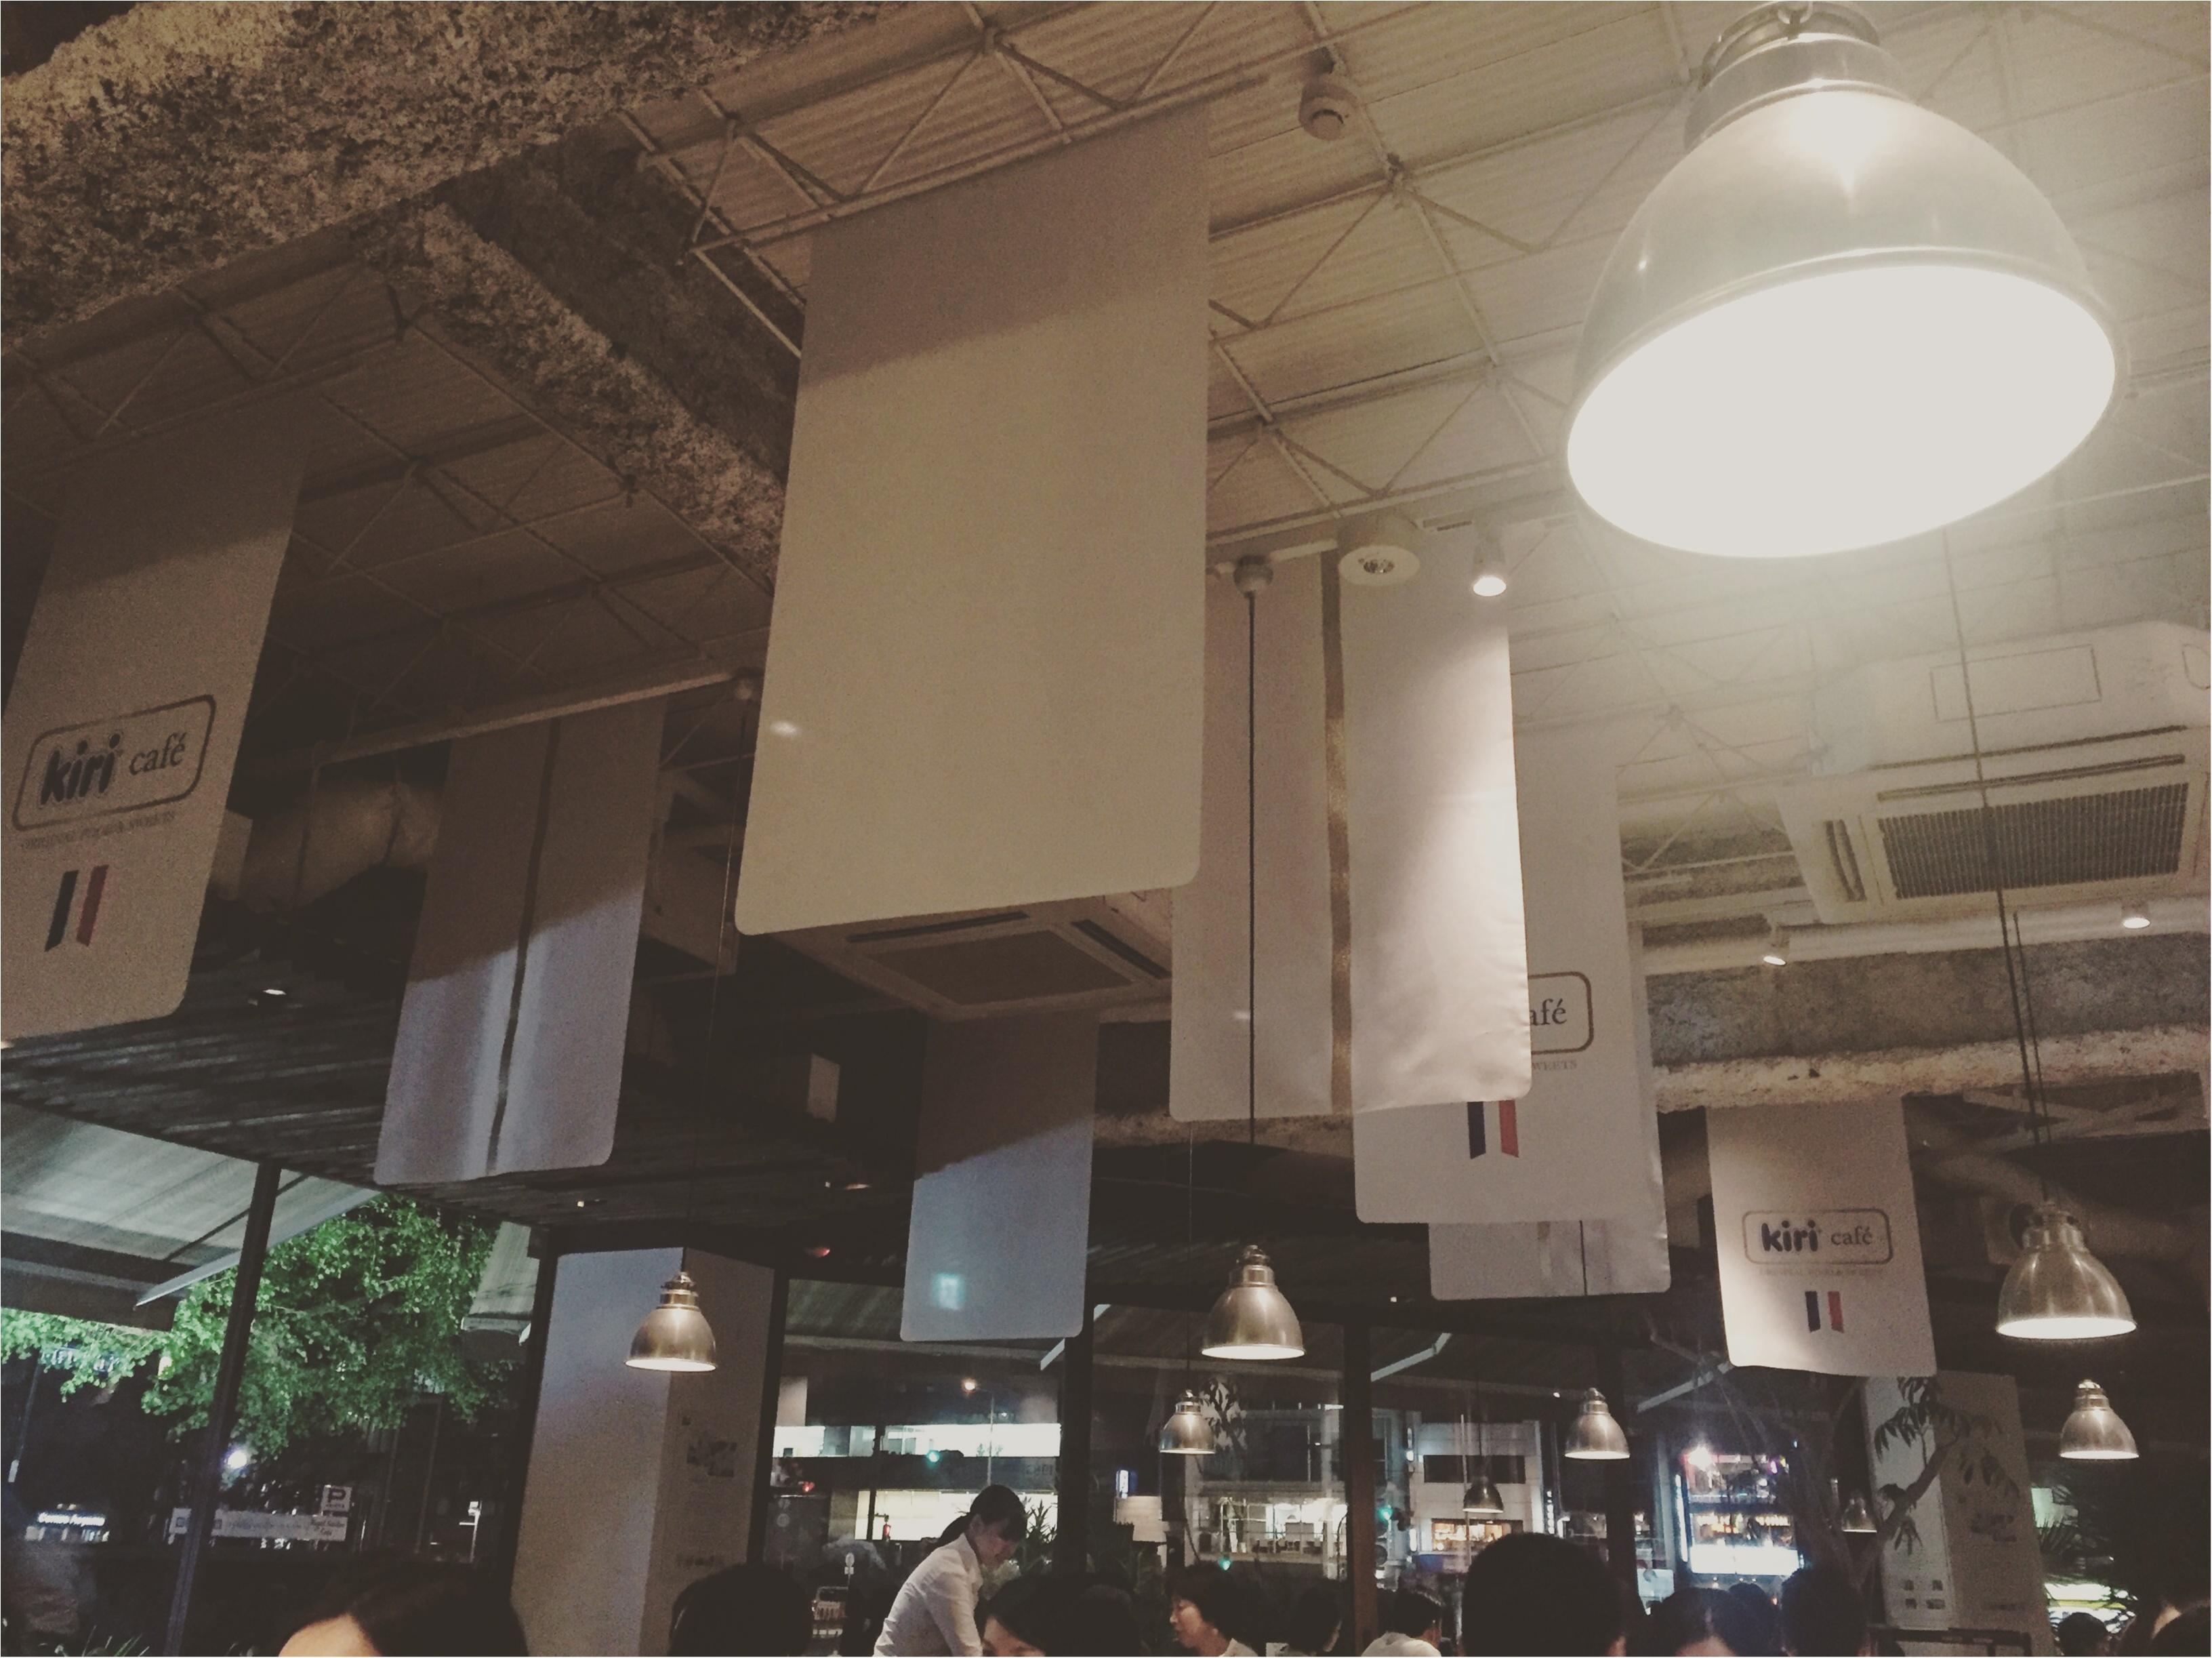 【GWお出掛けスポット】5/12まで!kiriのクリームチーズを使用したスイーツやフードが楽しめる『kiri cafe』レポ♡≪samenyan≫_3